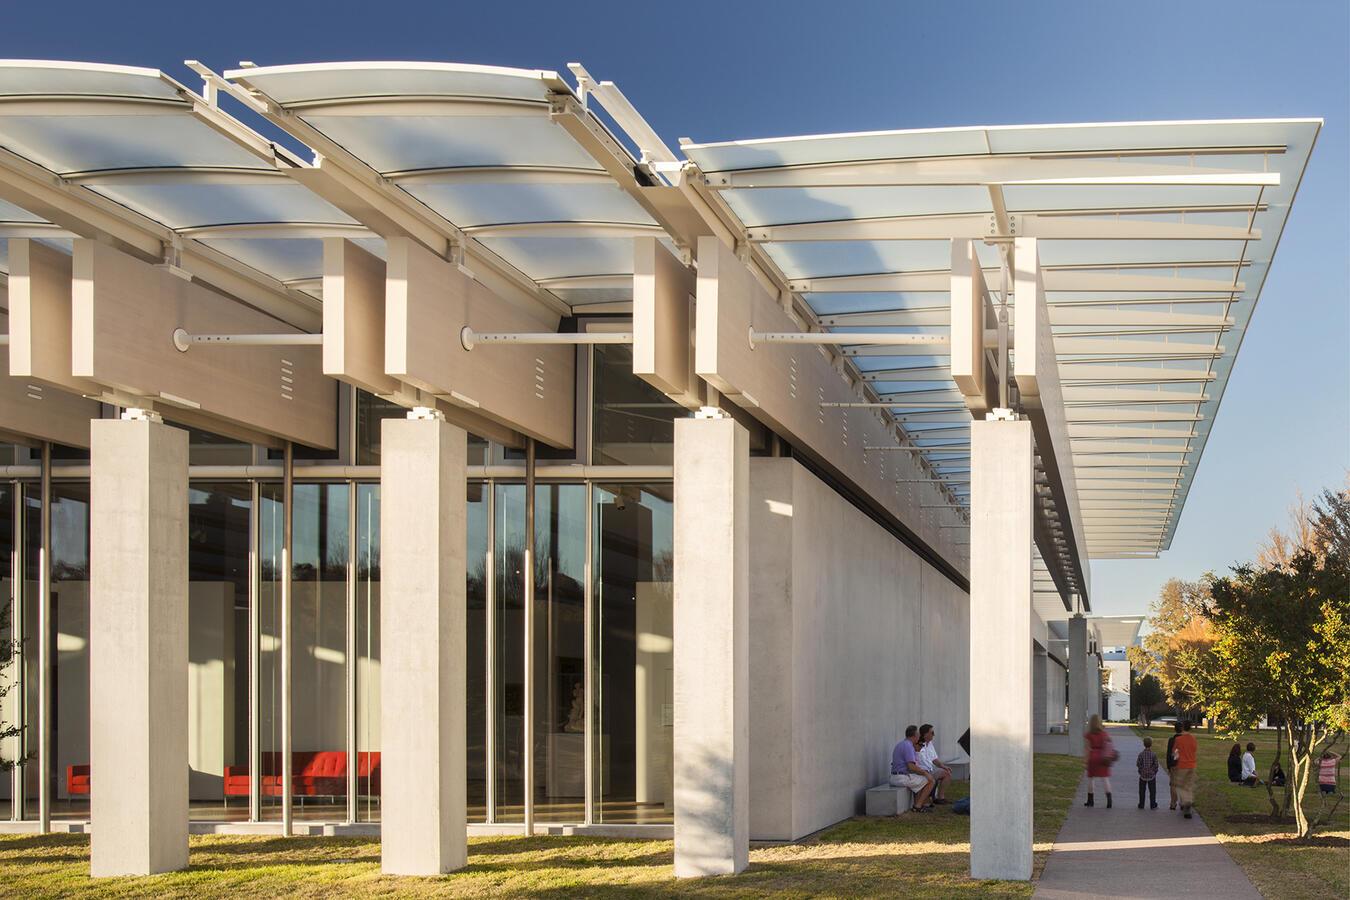 Renzo Piano Pavilion façade, photograph by Nic Lehoux